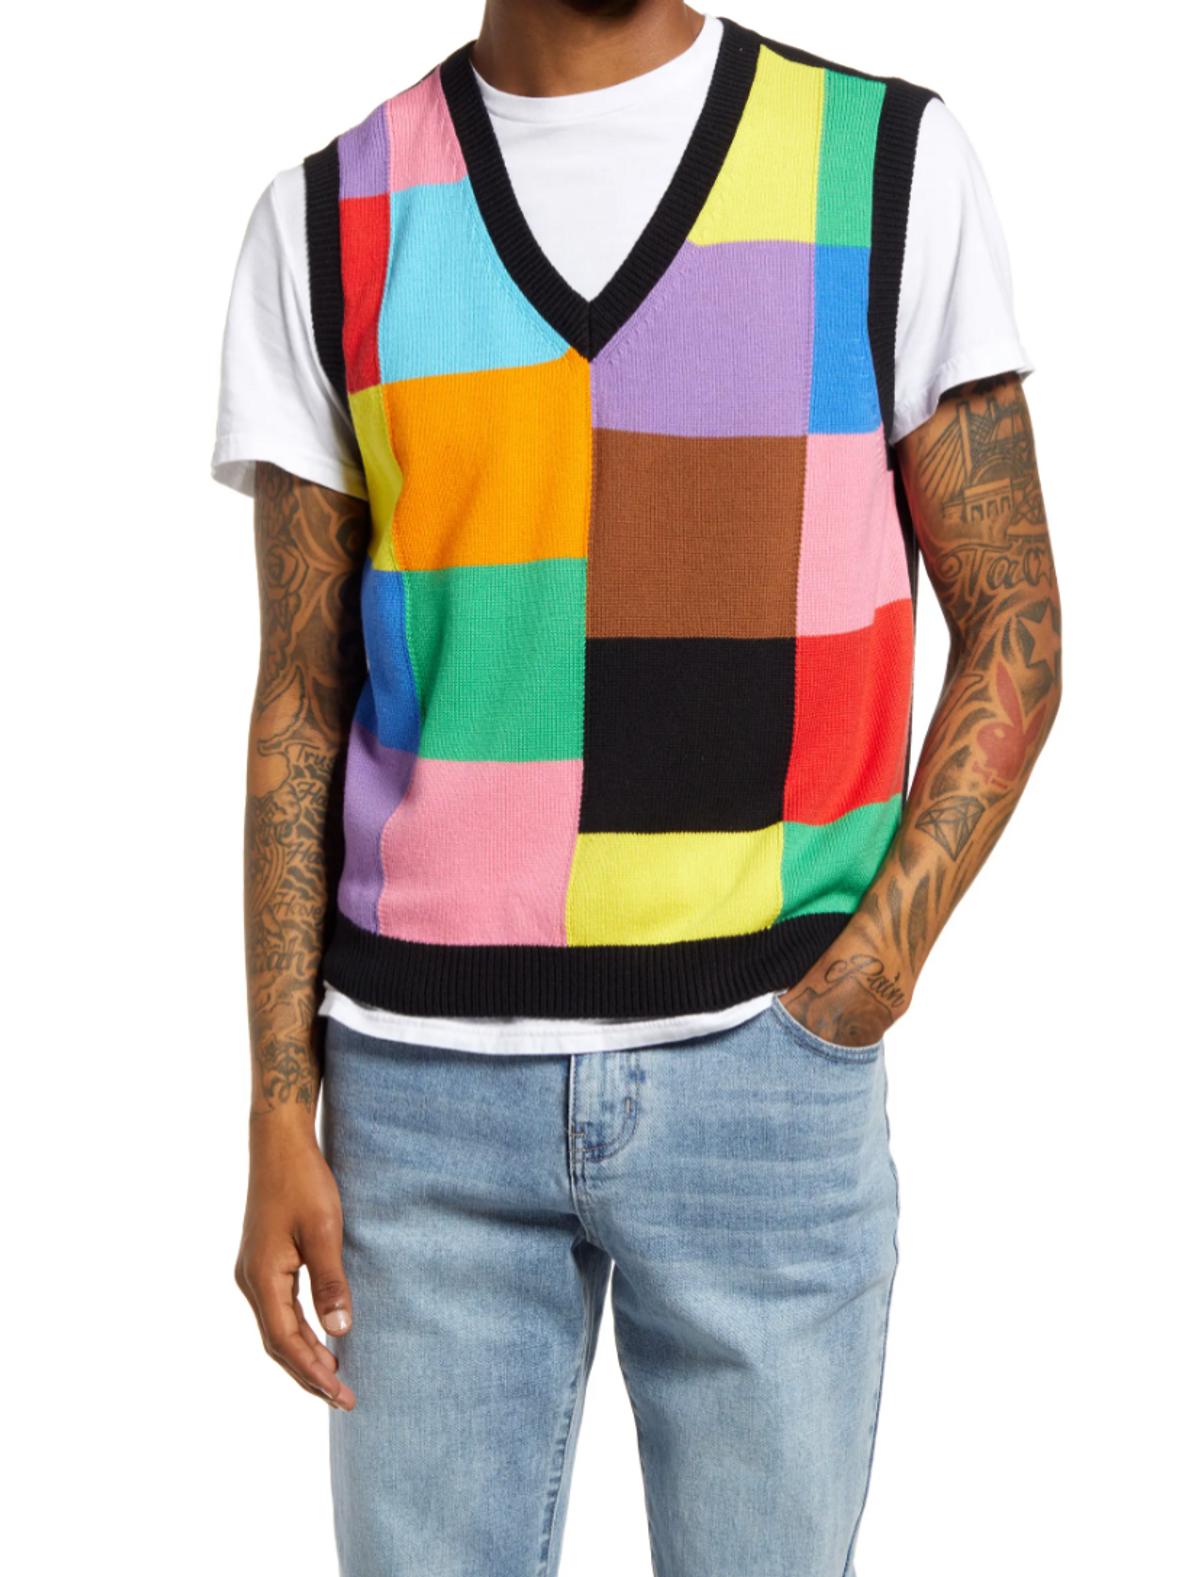 Gender Inclusive Pride Colorblock Sweater Vest